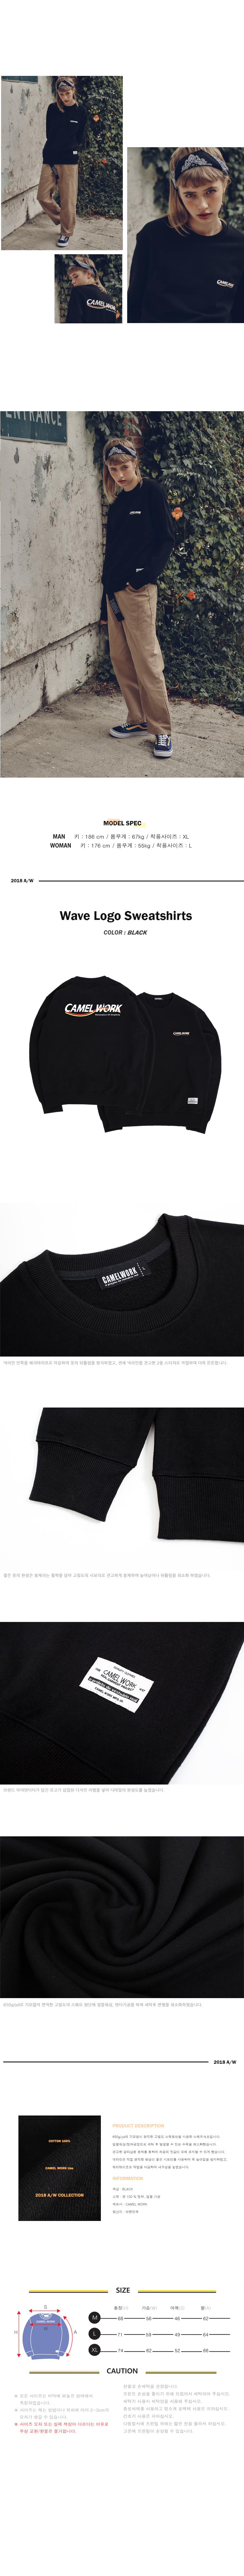 wave logo sweatshirts b2.jpg